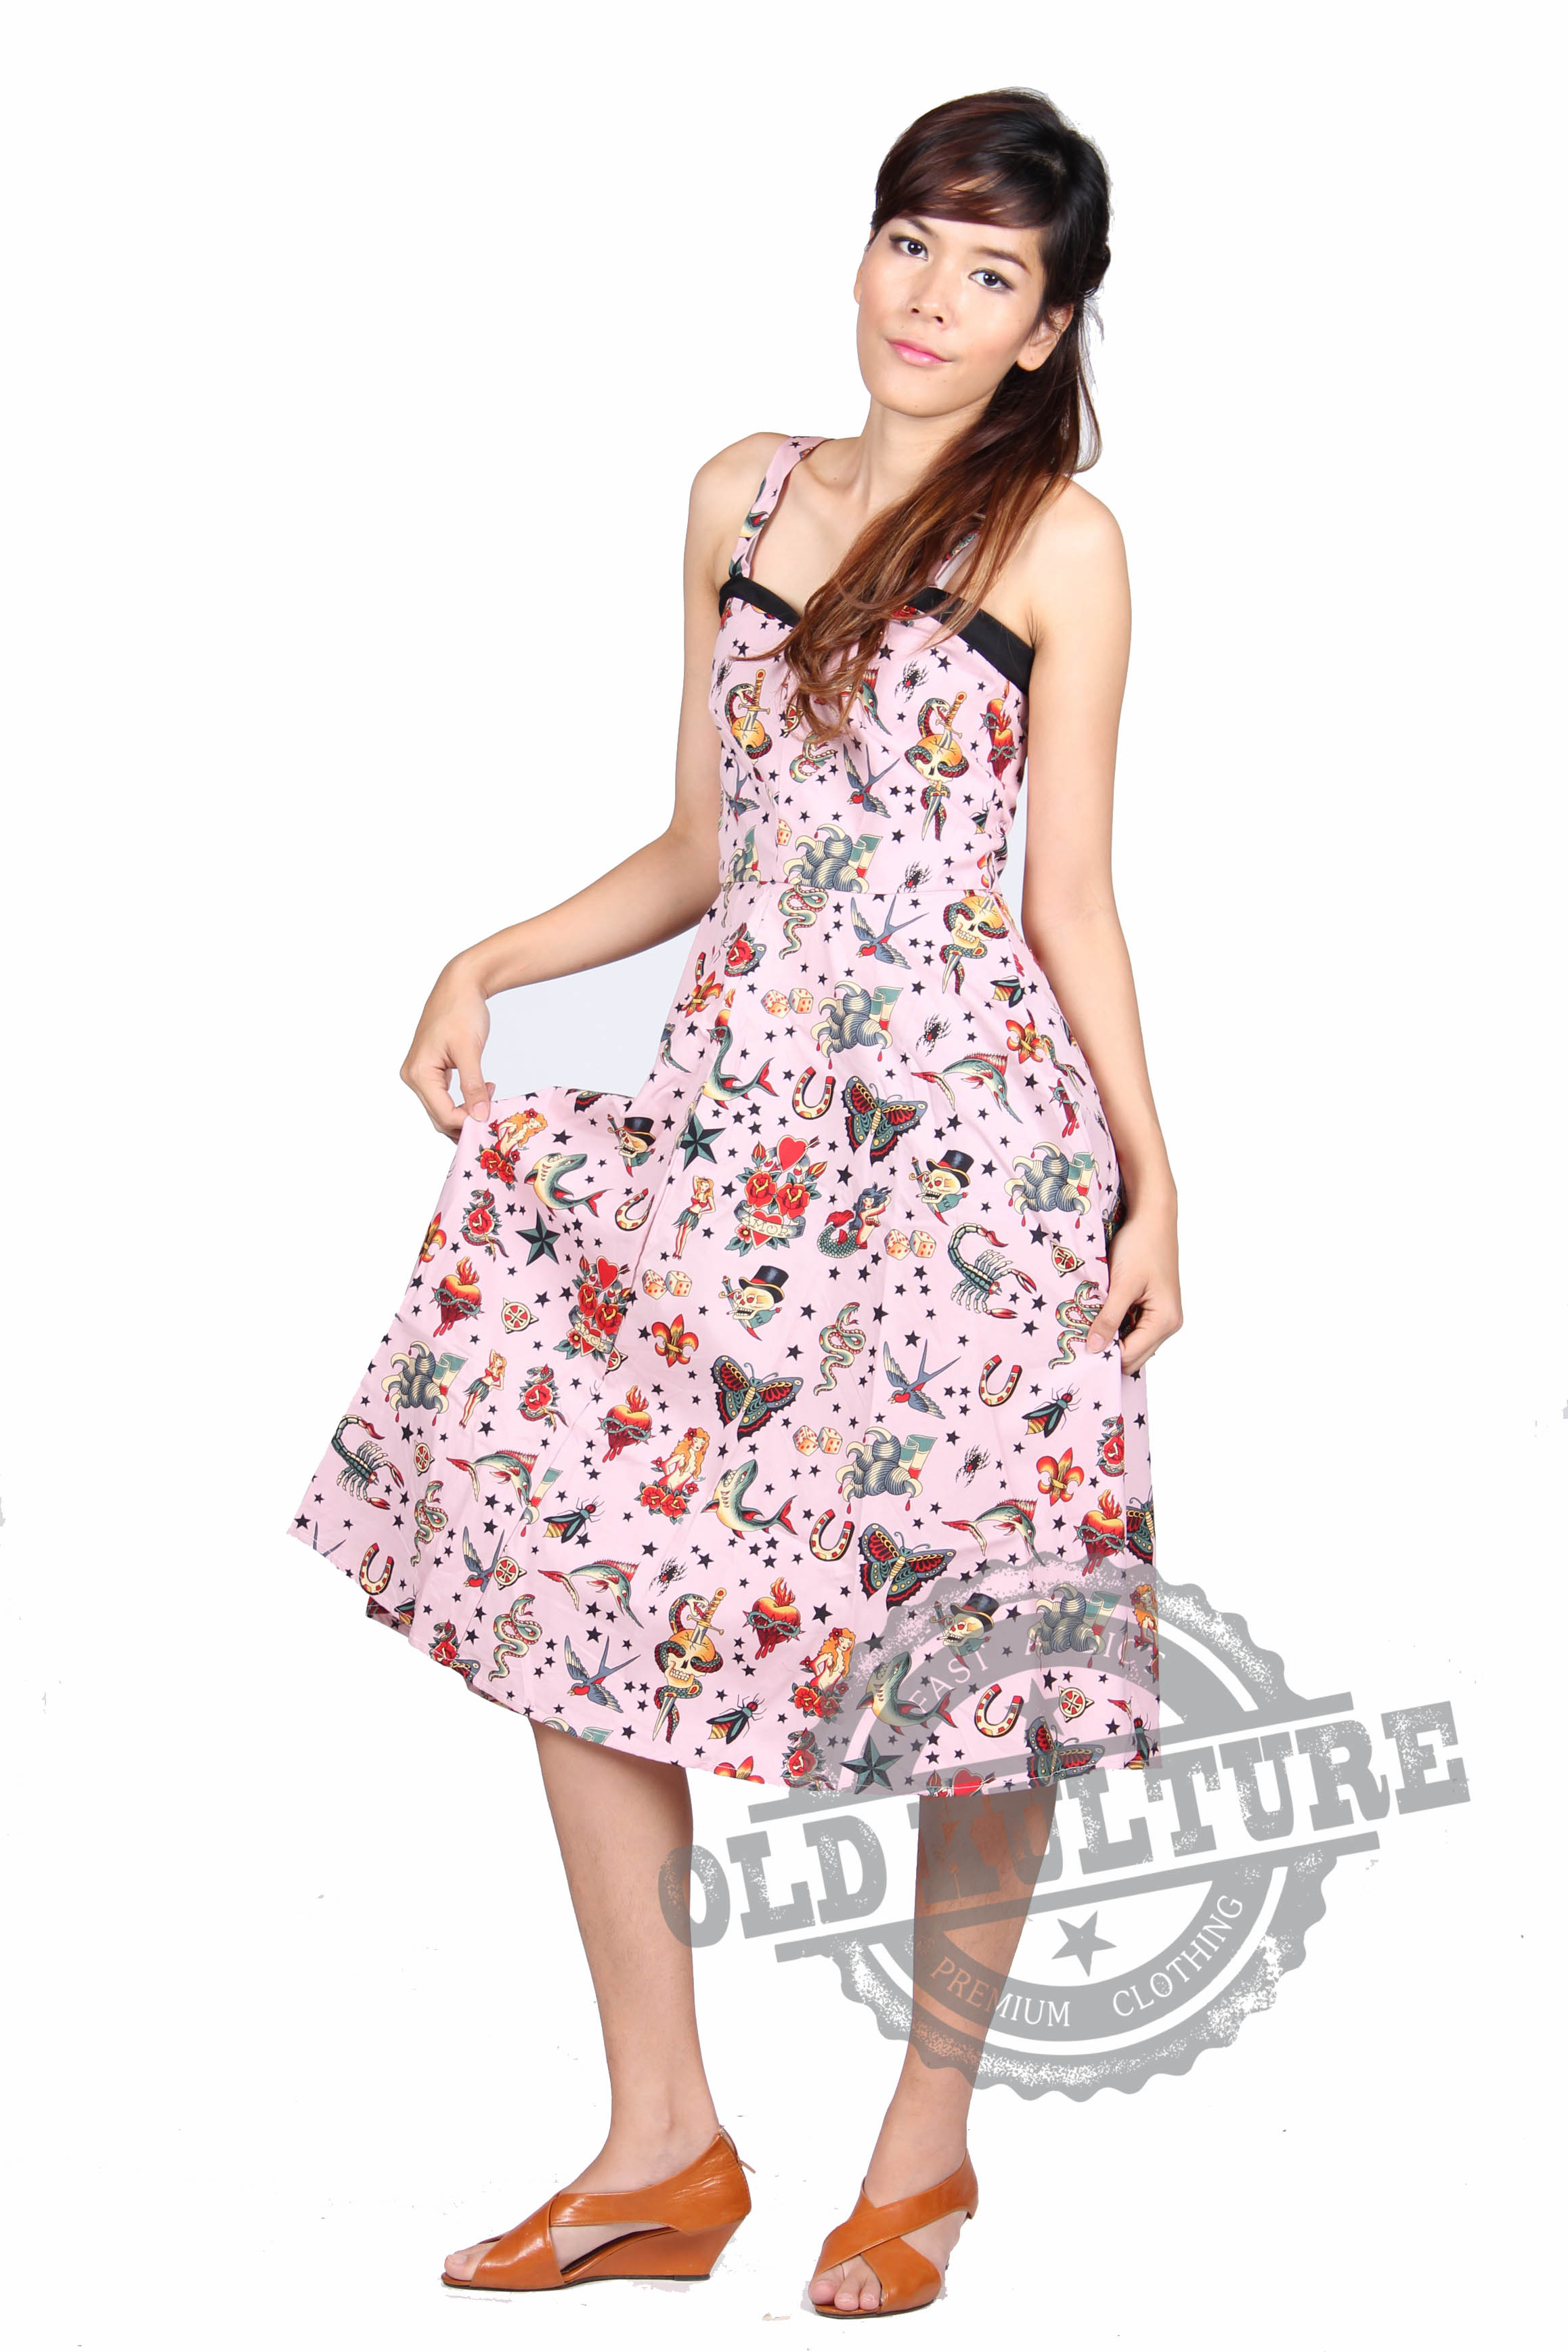 rockabilly_women_dress_skull_roses_retro_vintage_pin_up_cocktail_prom_party_unique_design_d17_dresses_4.JPG